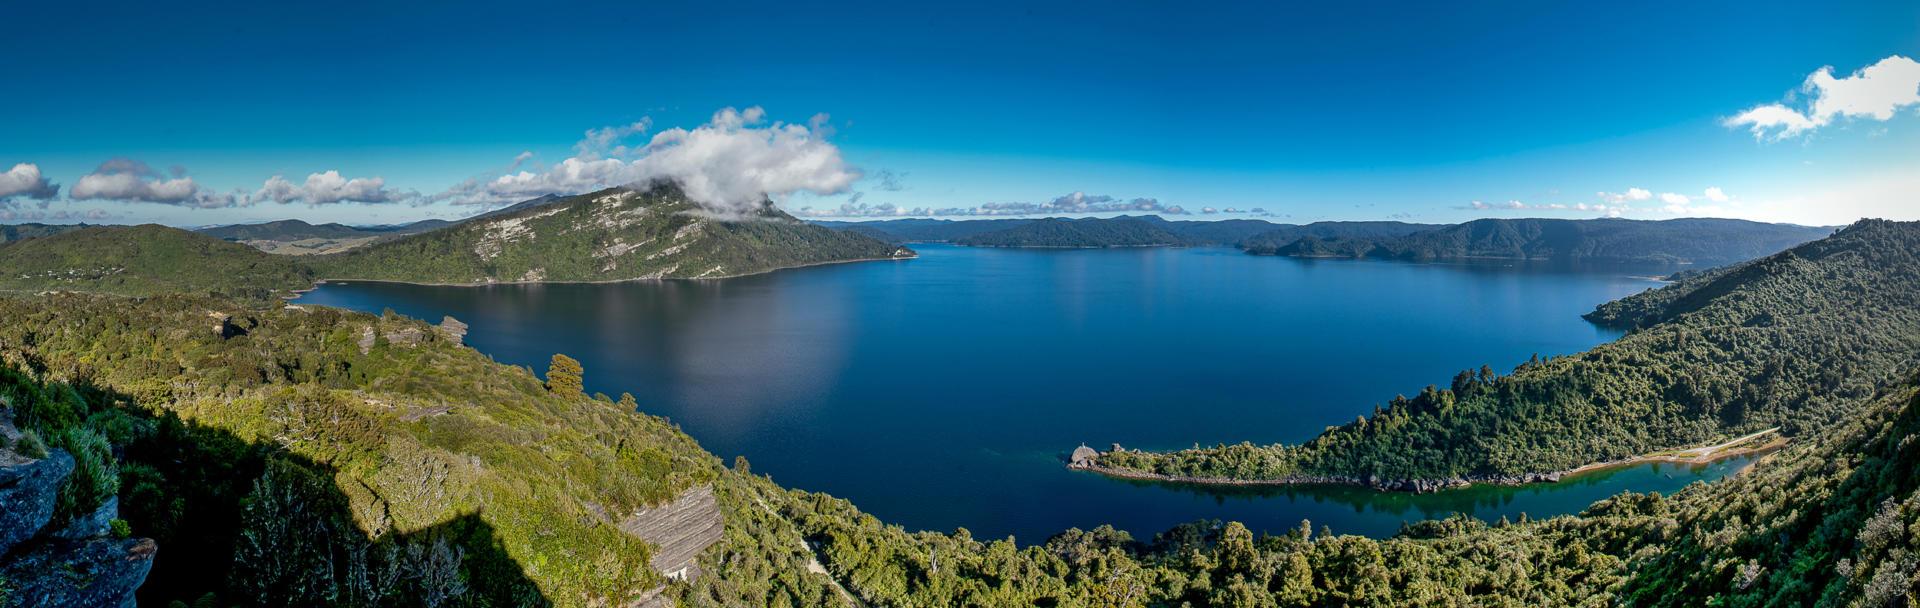 Hawkes Bay Waikaremoana 03 P